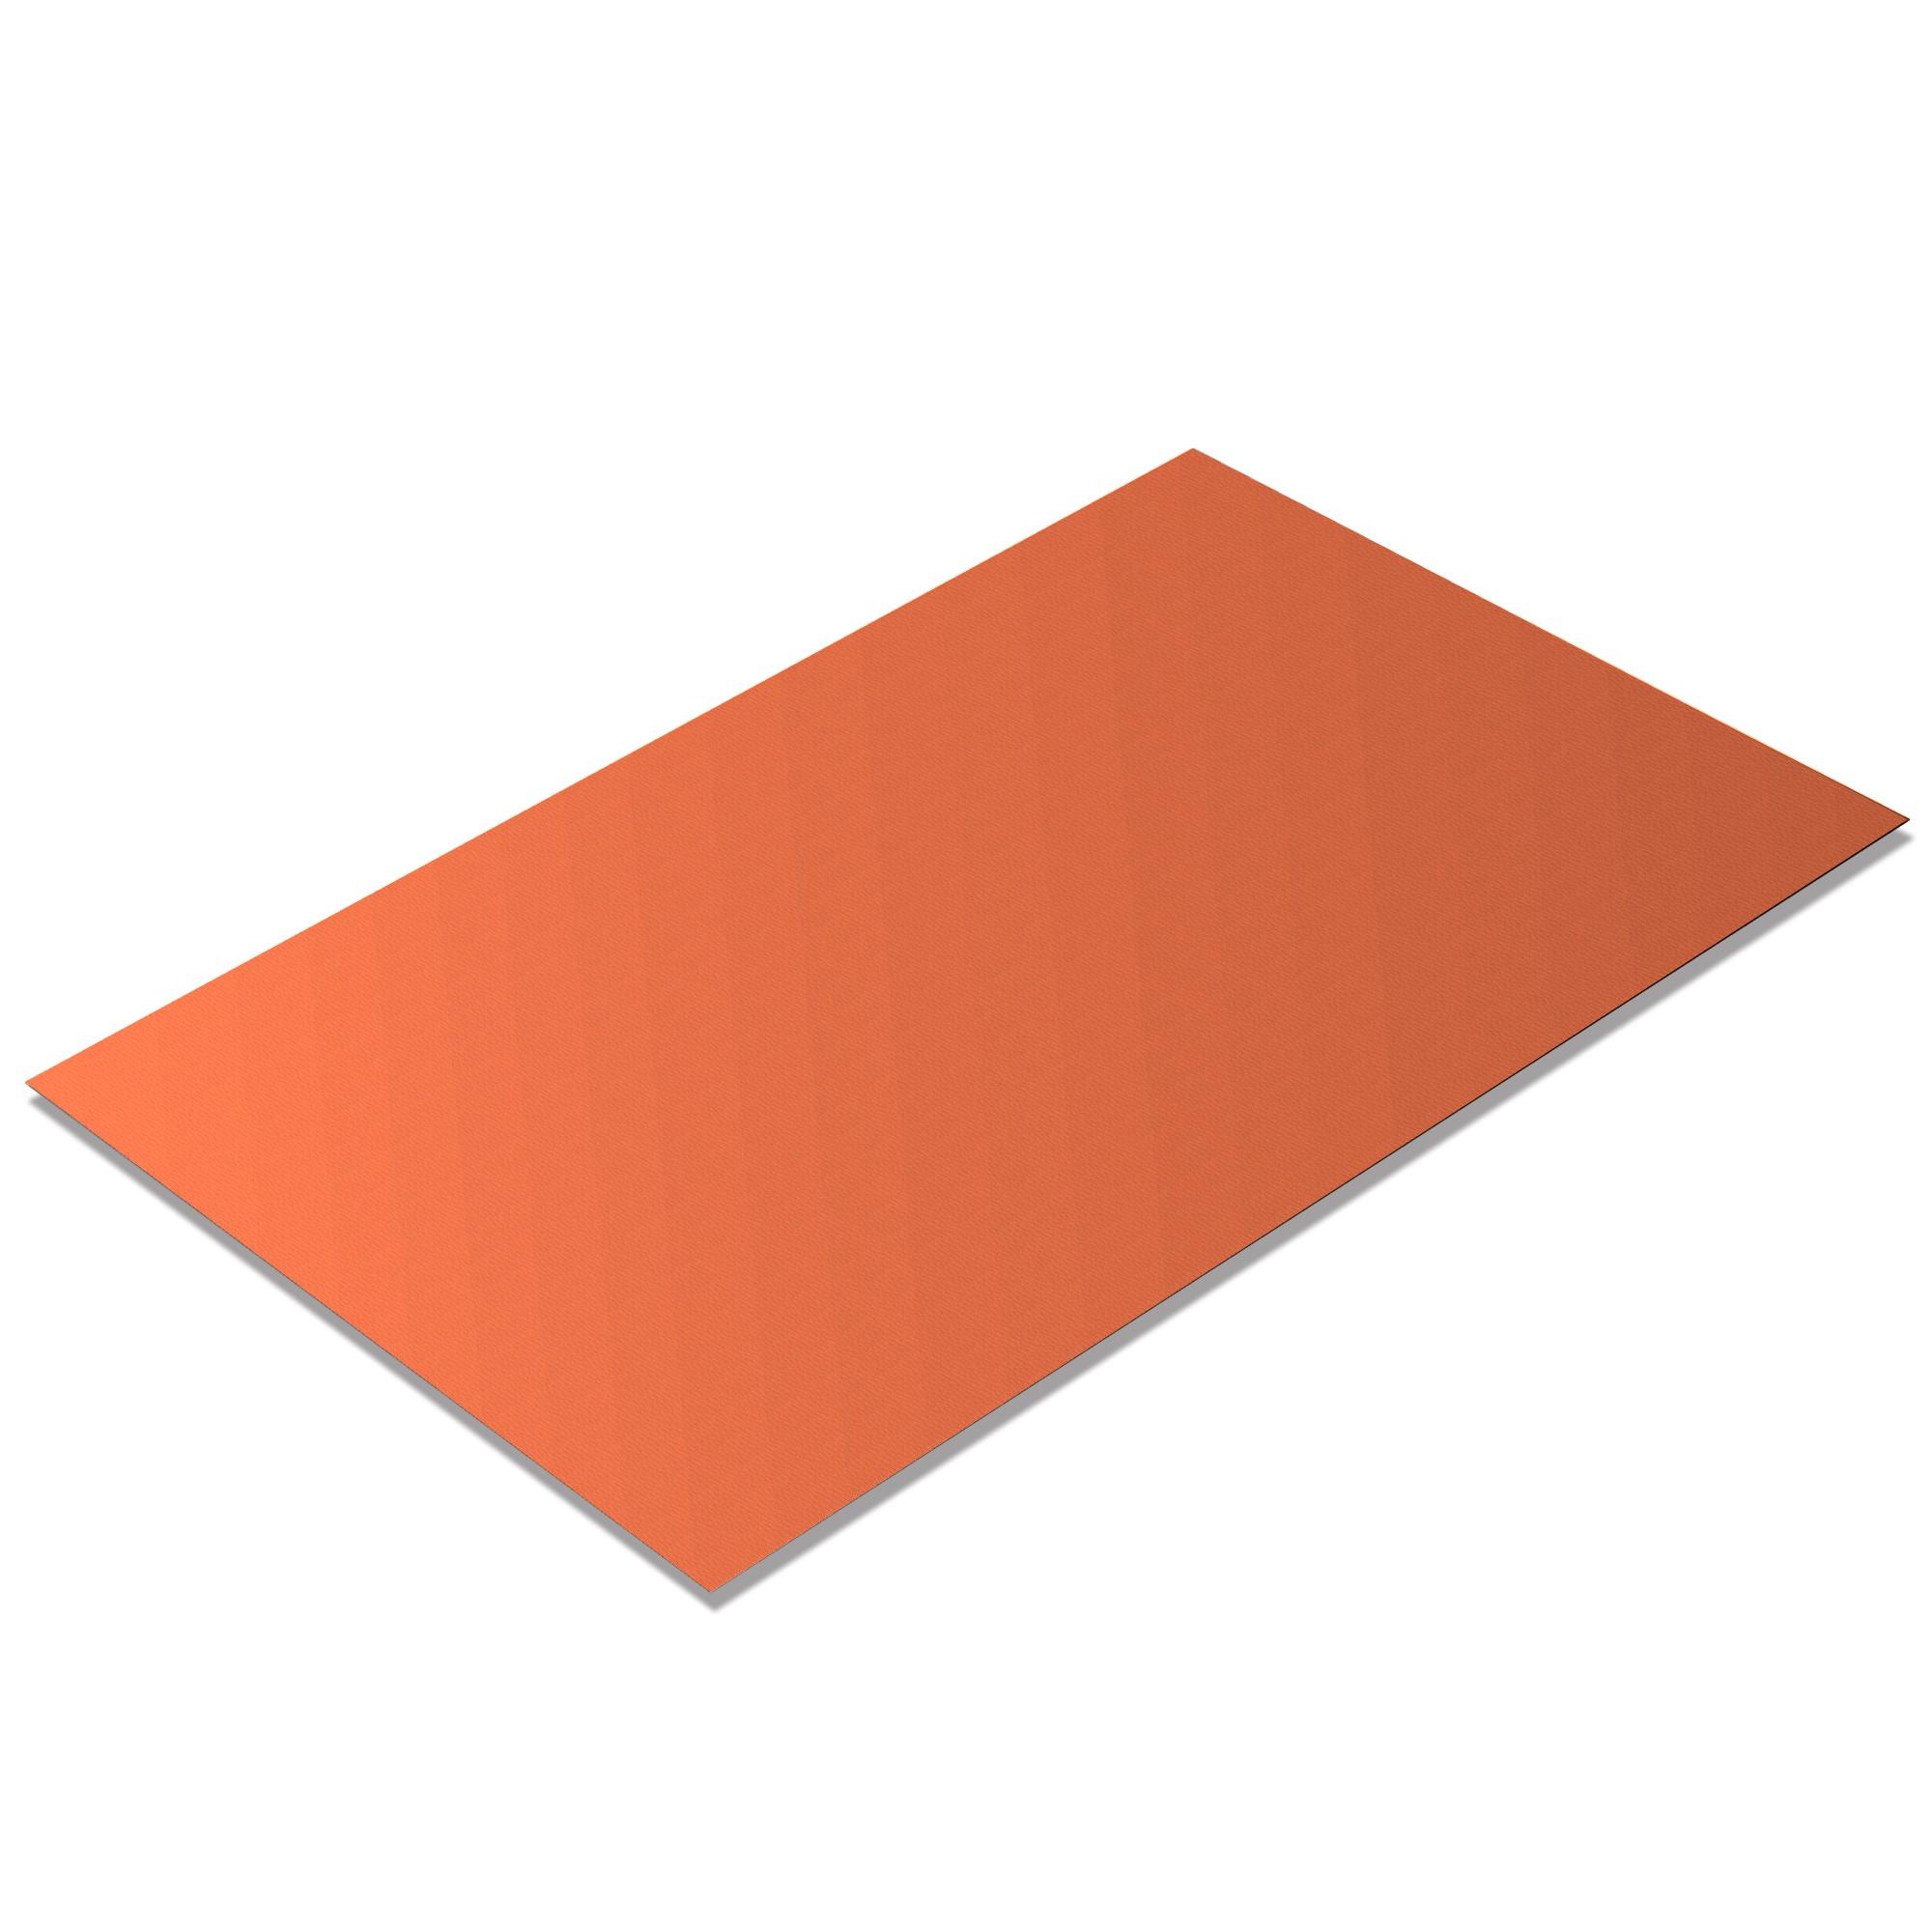 Kunstleder Meterware Nevada Orangebraun [NEV3188]